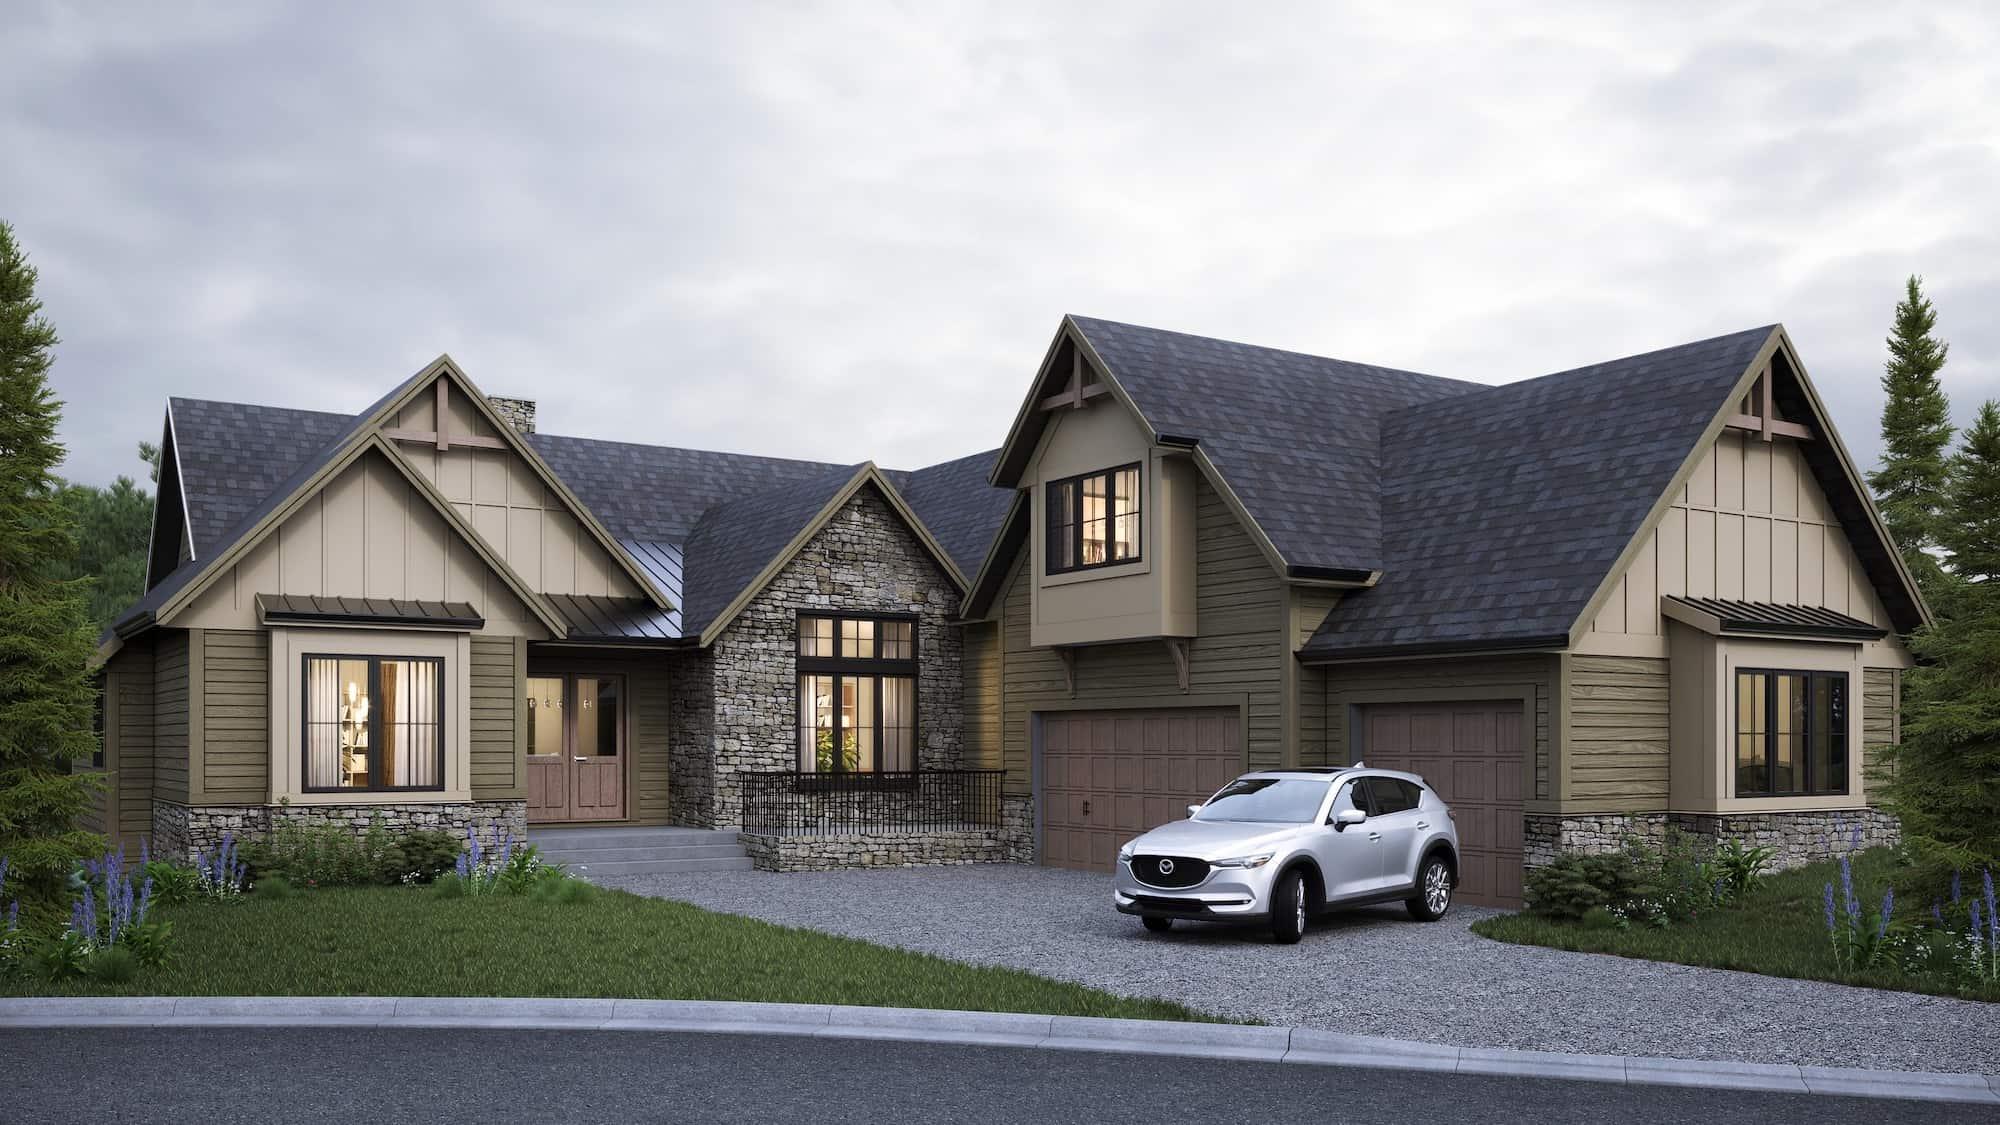 Rodeo Ridge - Craftsman Bungalow custom residential architecture